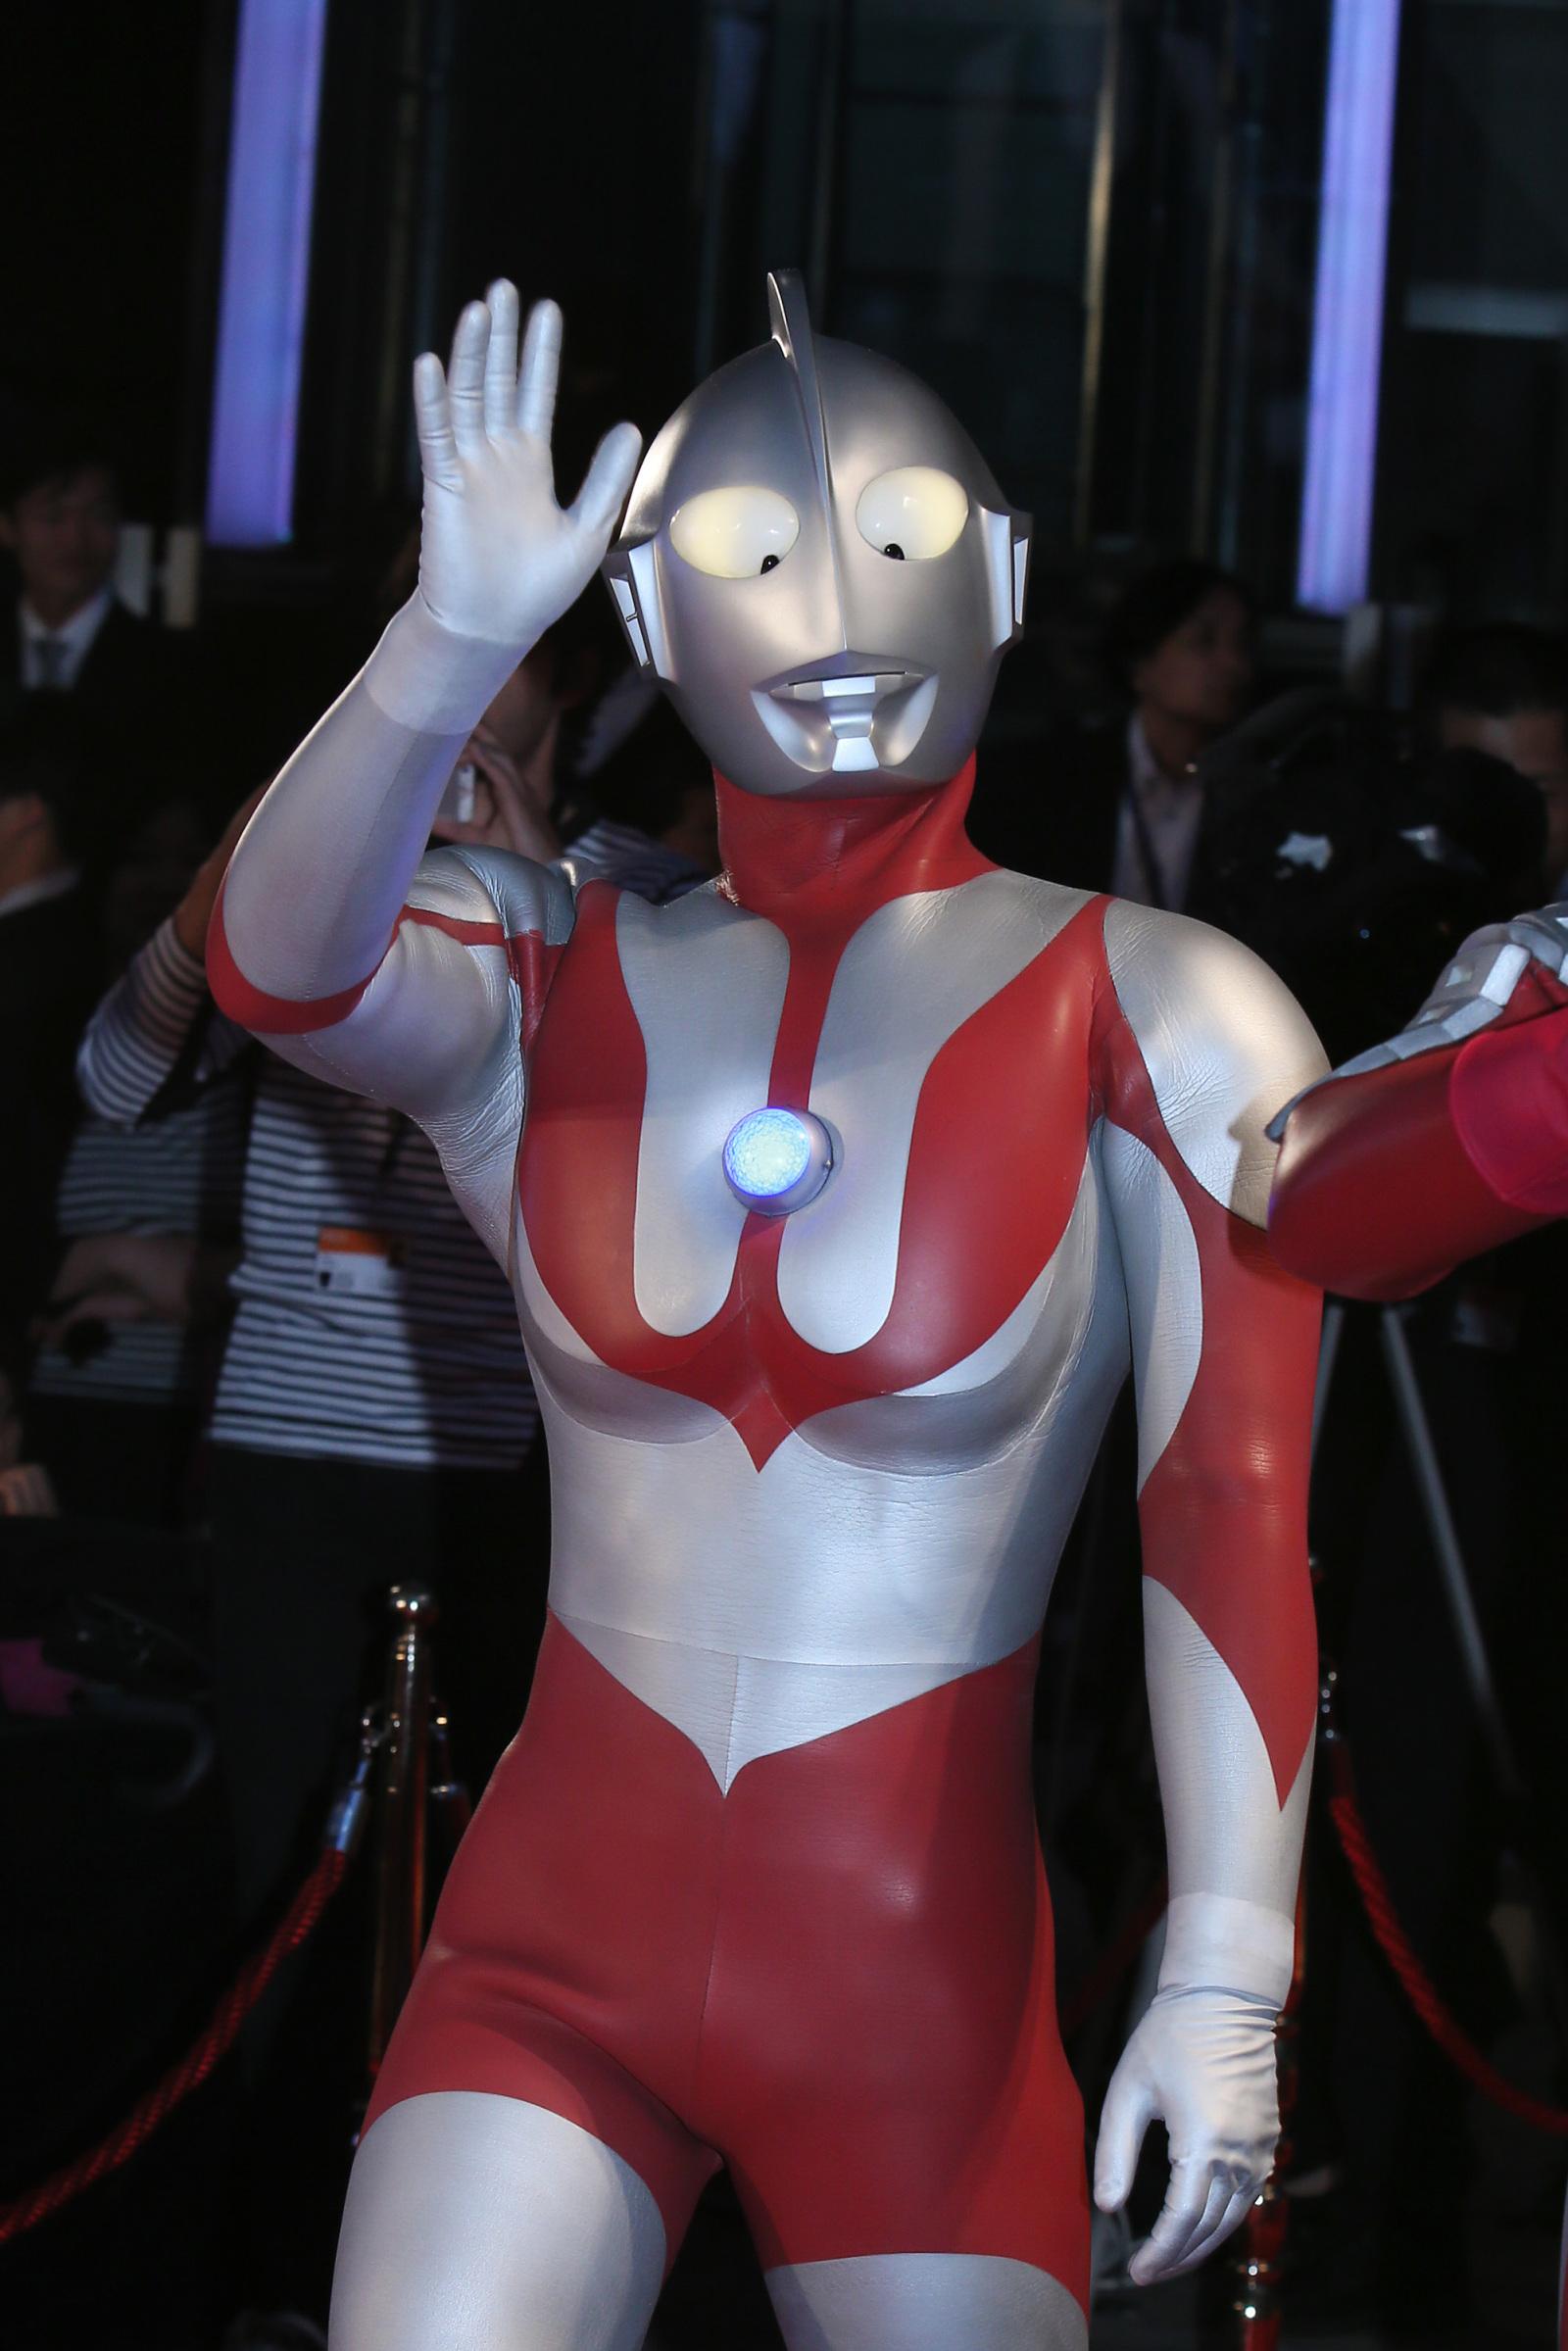 Ultraman season 1, episode 9 recap: Nice To Meet You, Brother